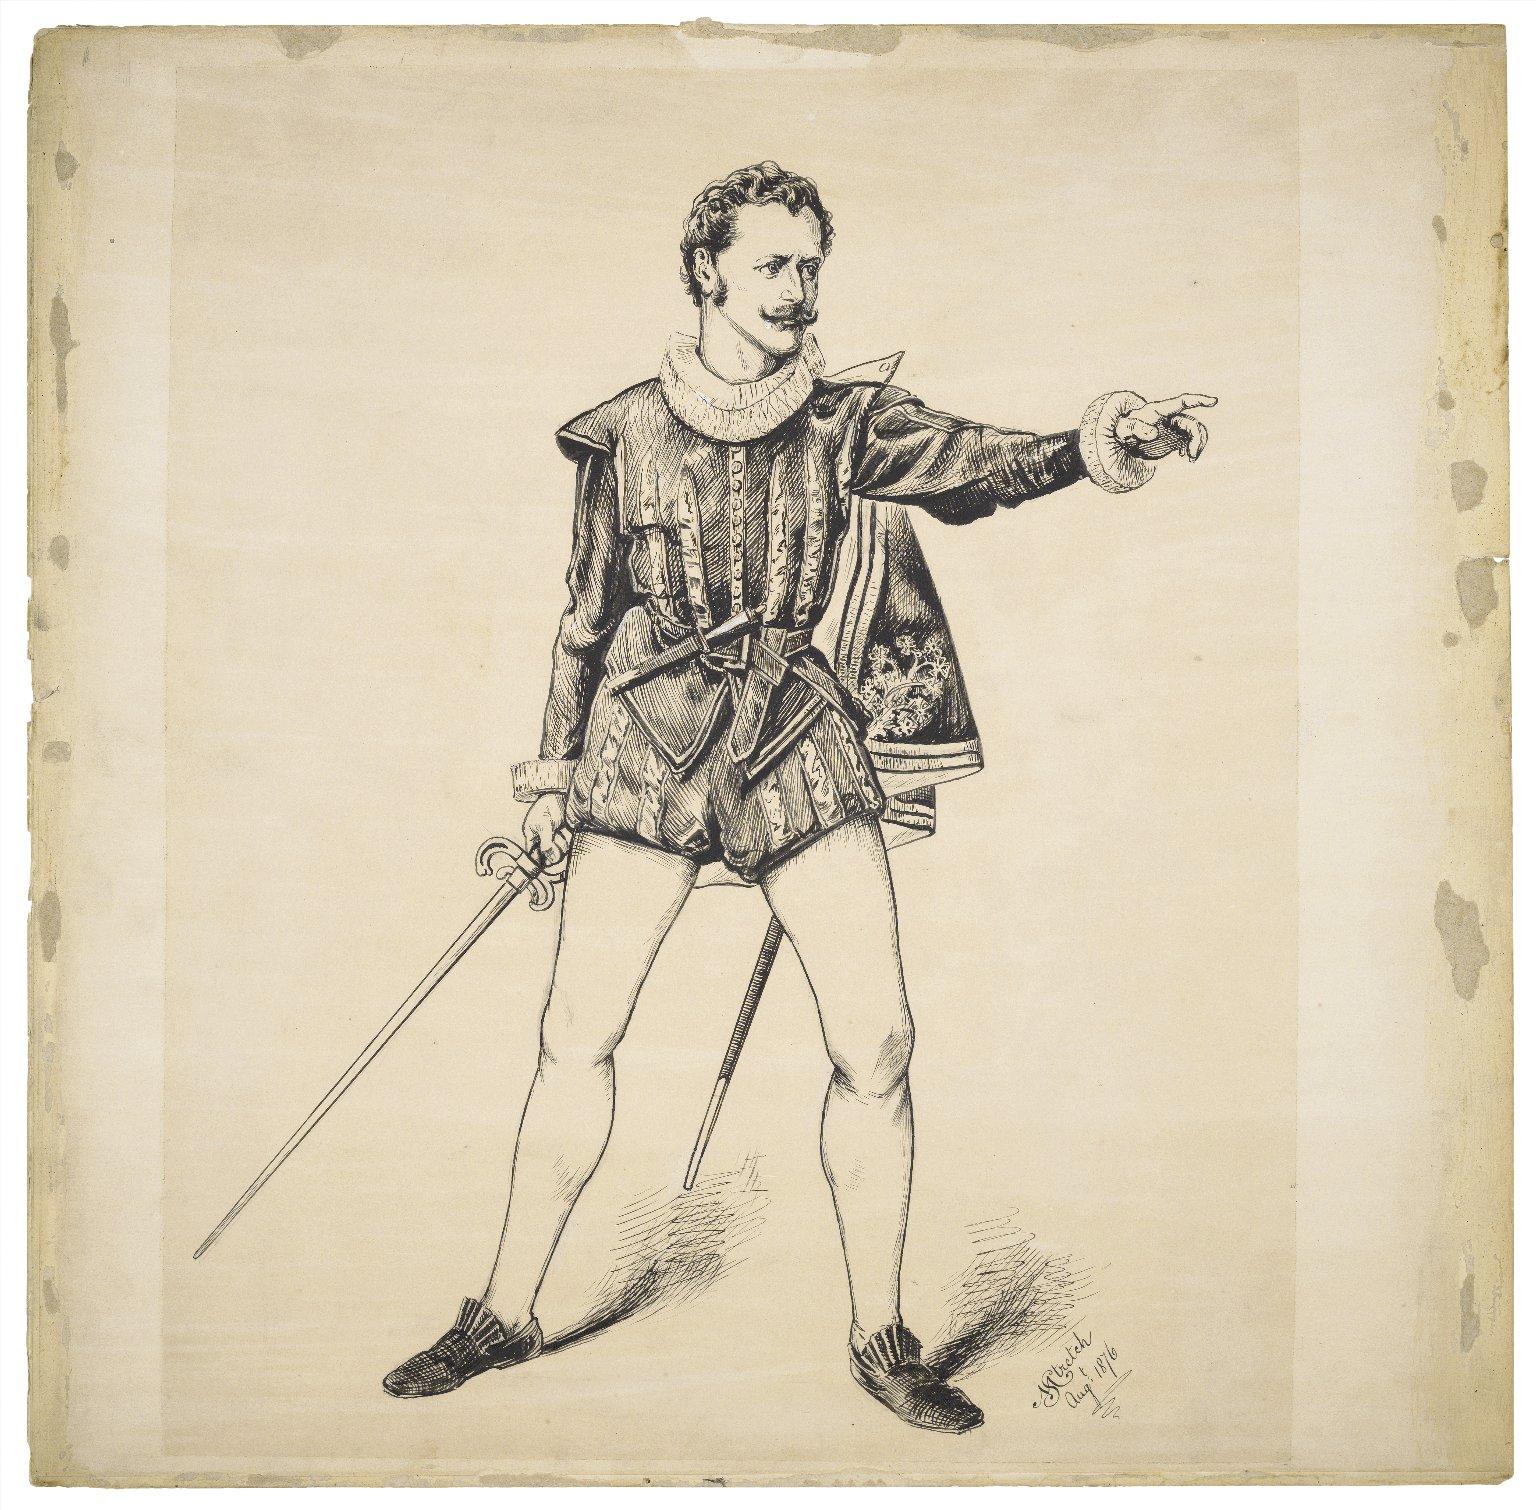 [Harry St. Maur as Mercutio] [graphic] / M. Stretch, Augt. 1876.